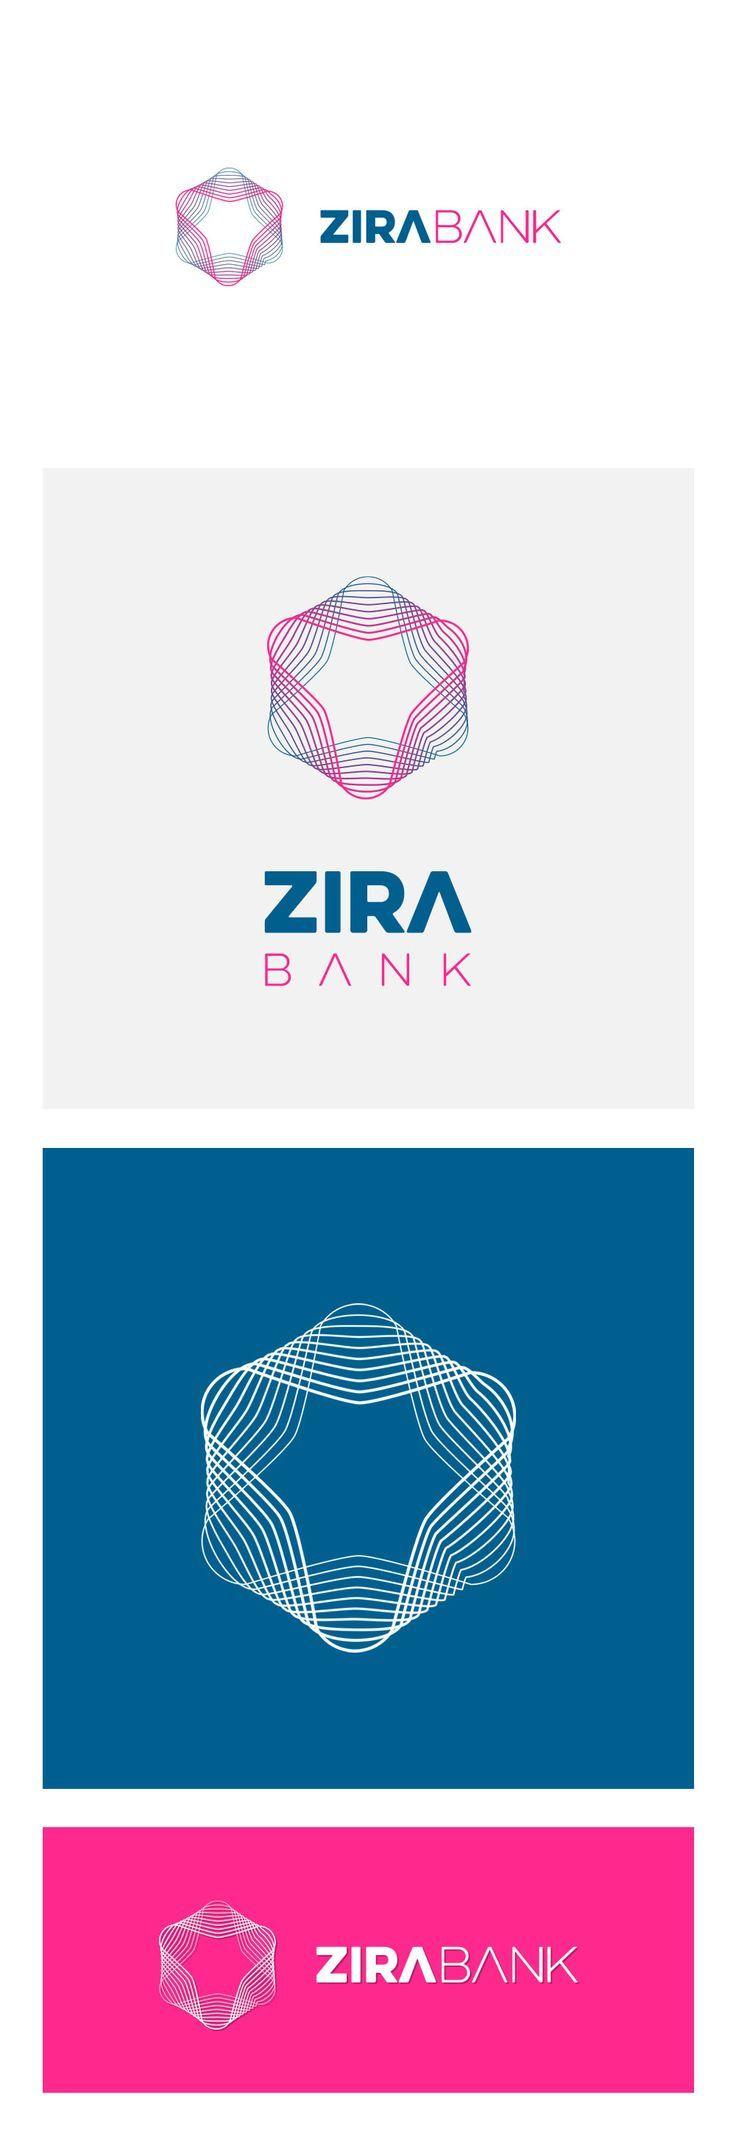 Zira Bank Logo, for Cryptocurrency concept mobile app (silverdesk.com)